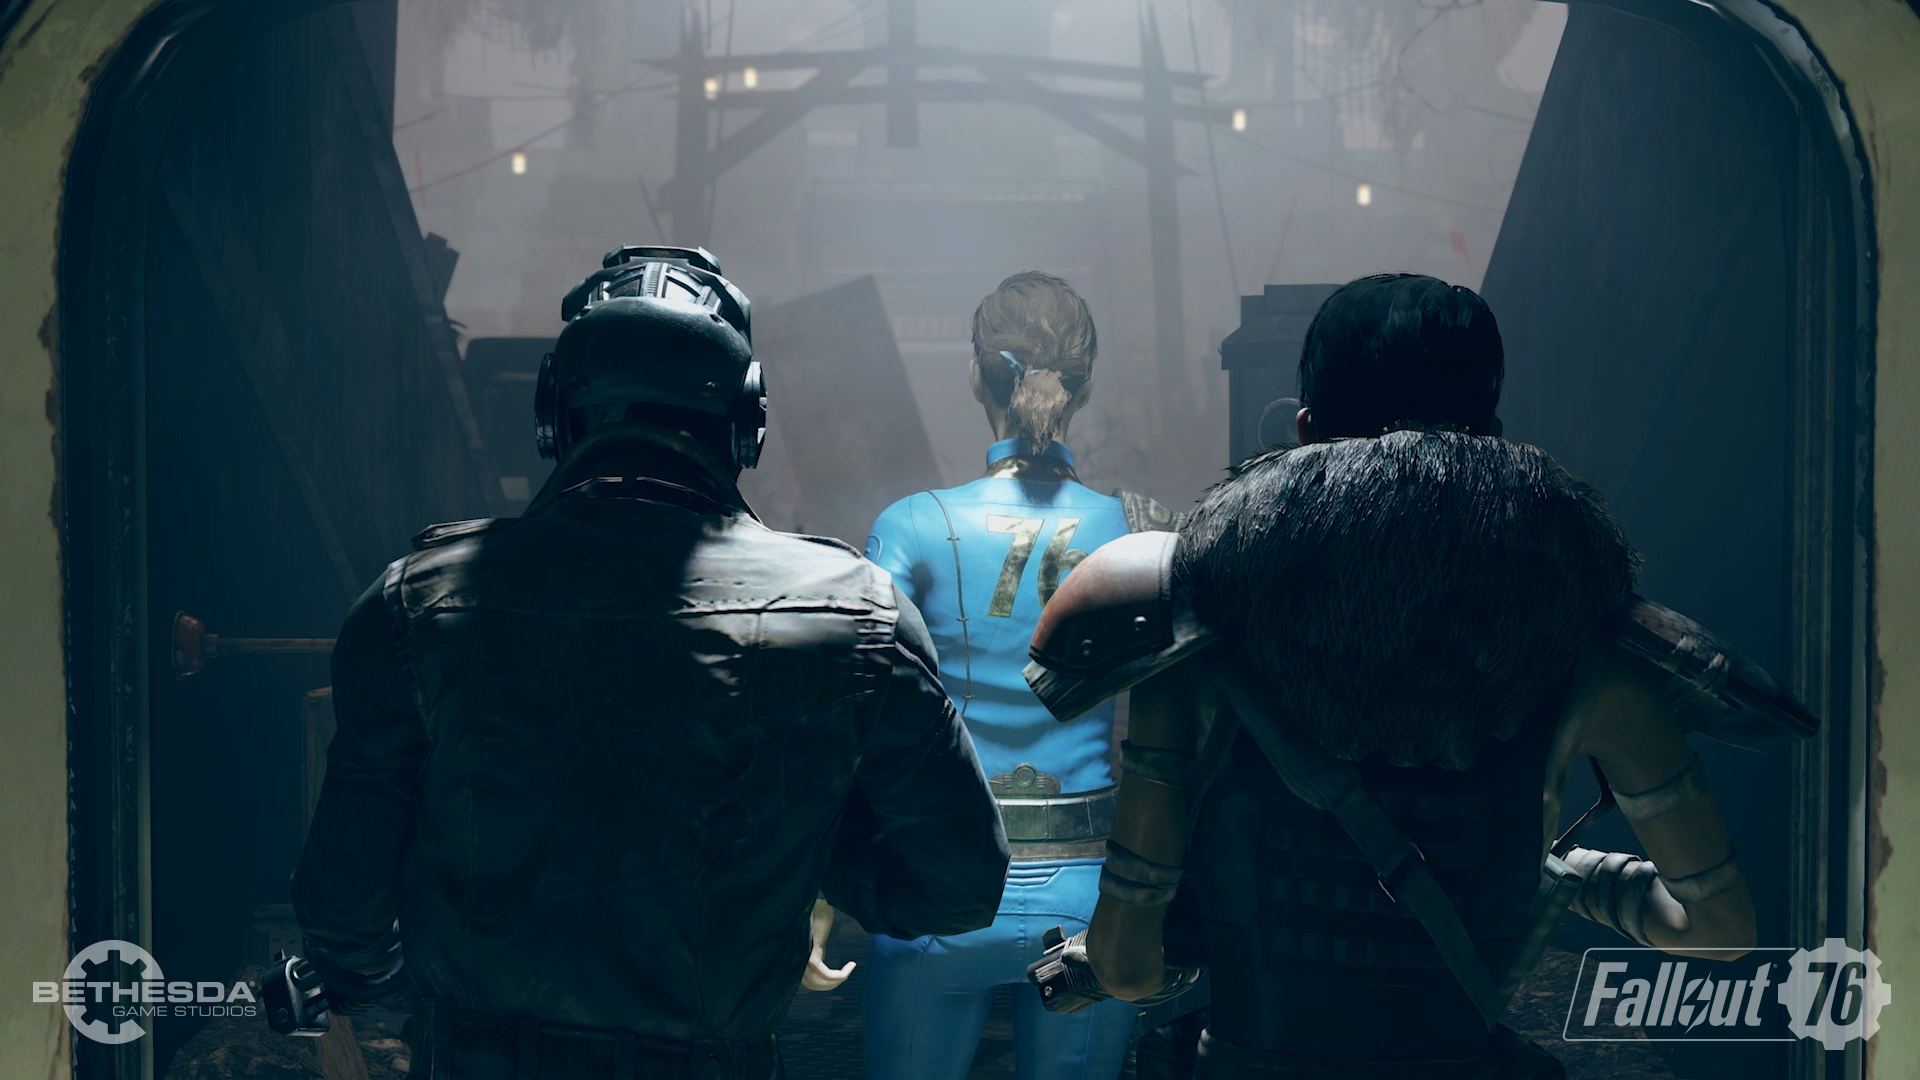 Fallout76-Wastelanders 07 1920x1080-WM